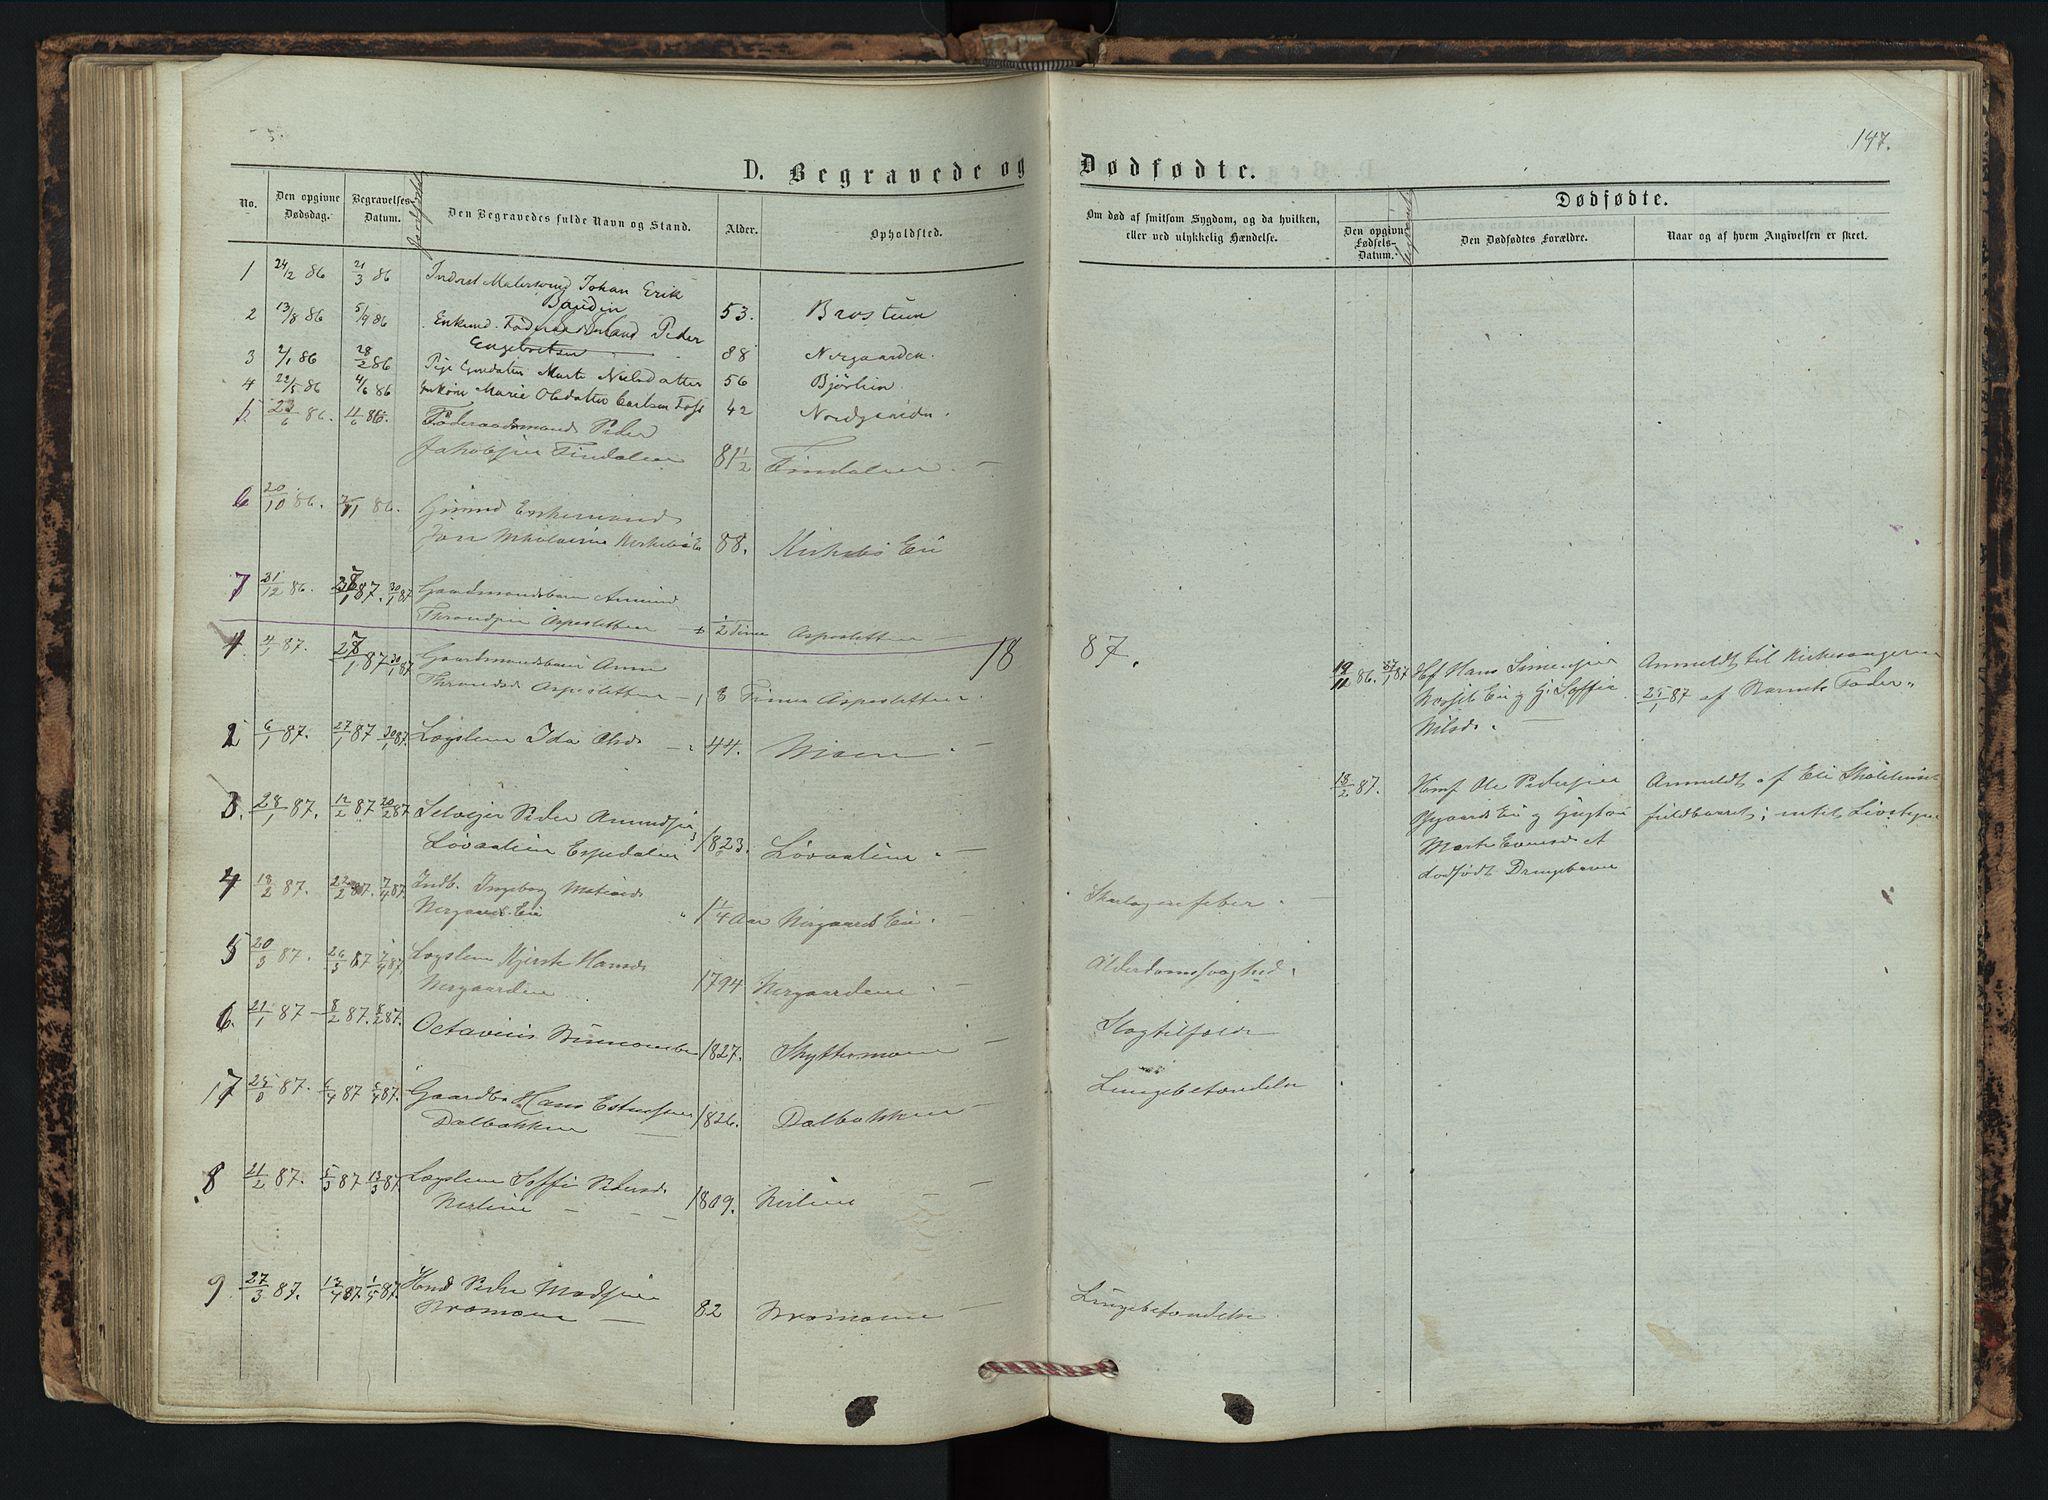 SAH, Vestre Gausdal prestekontor, Klokkerbok nr. 2, 1874-1897, s. 147